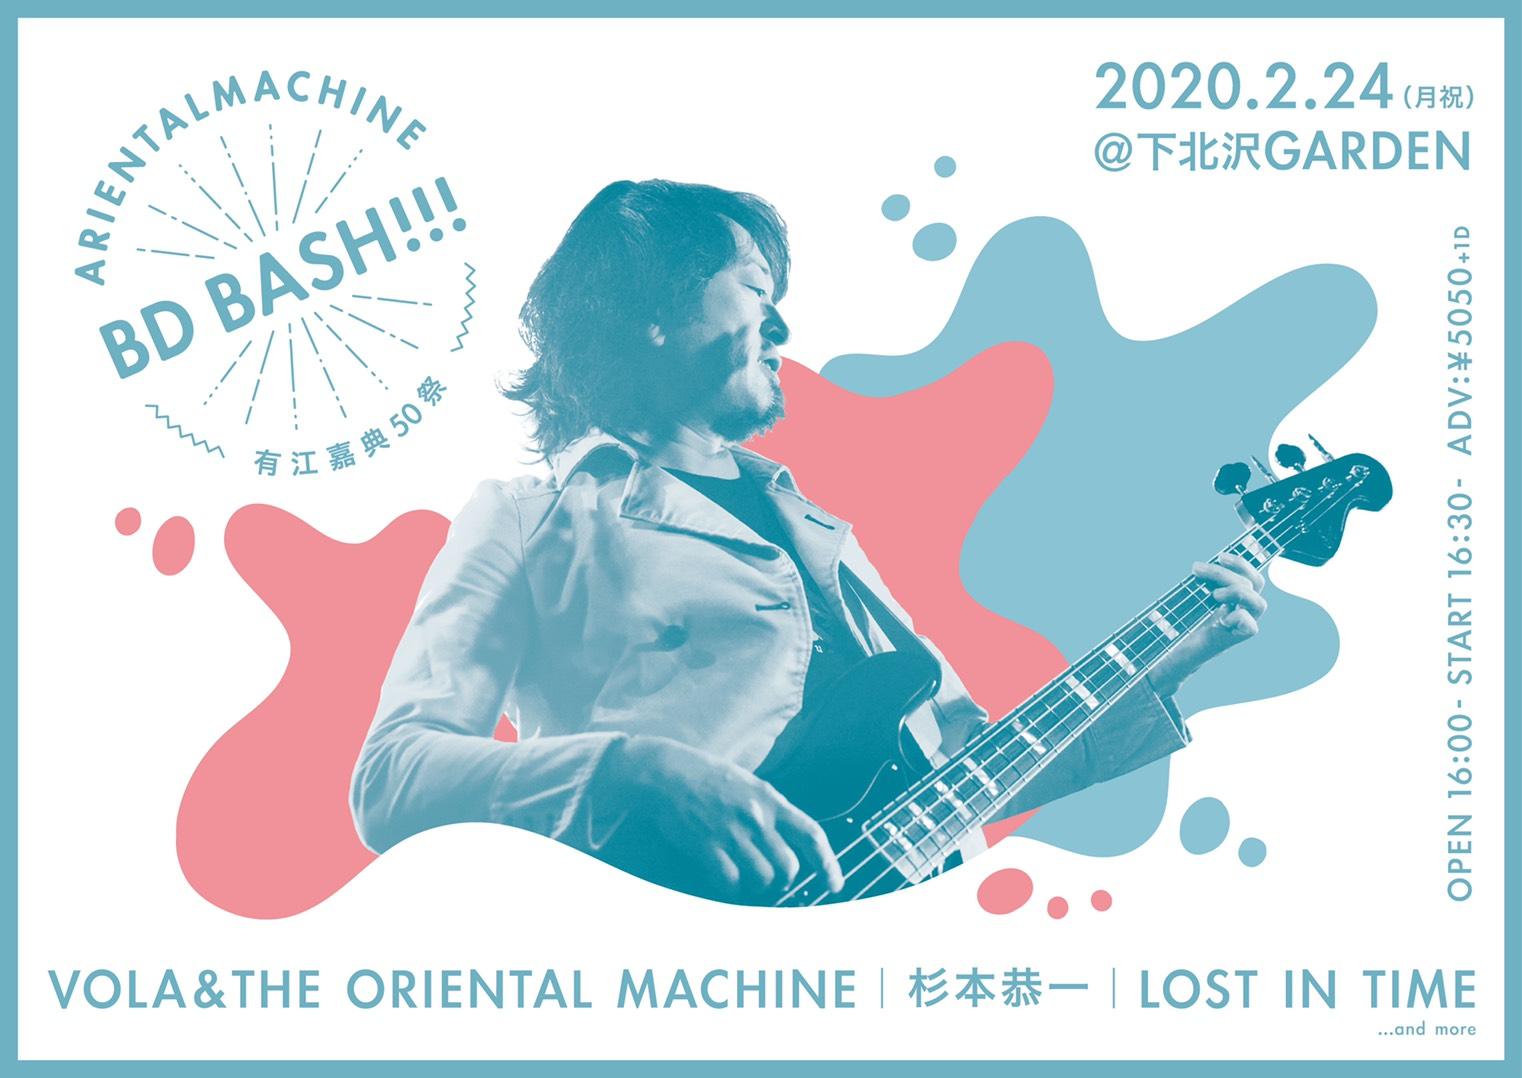 『Arientalmachine BD Bash!!! -有江嘉典50祭-』